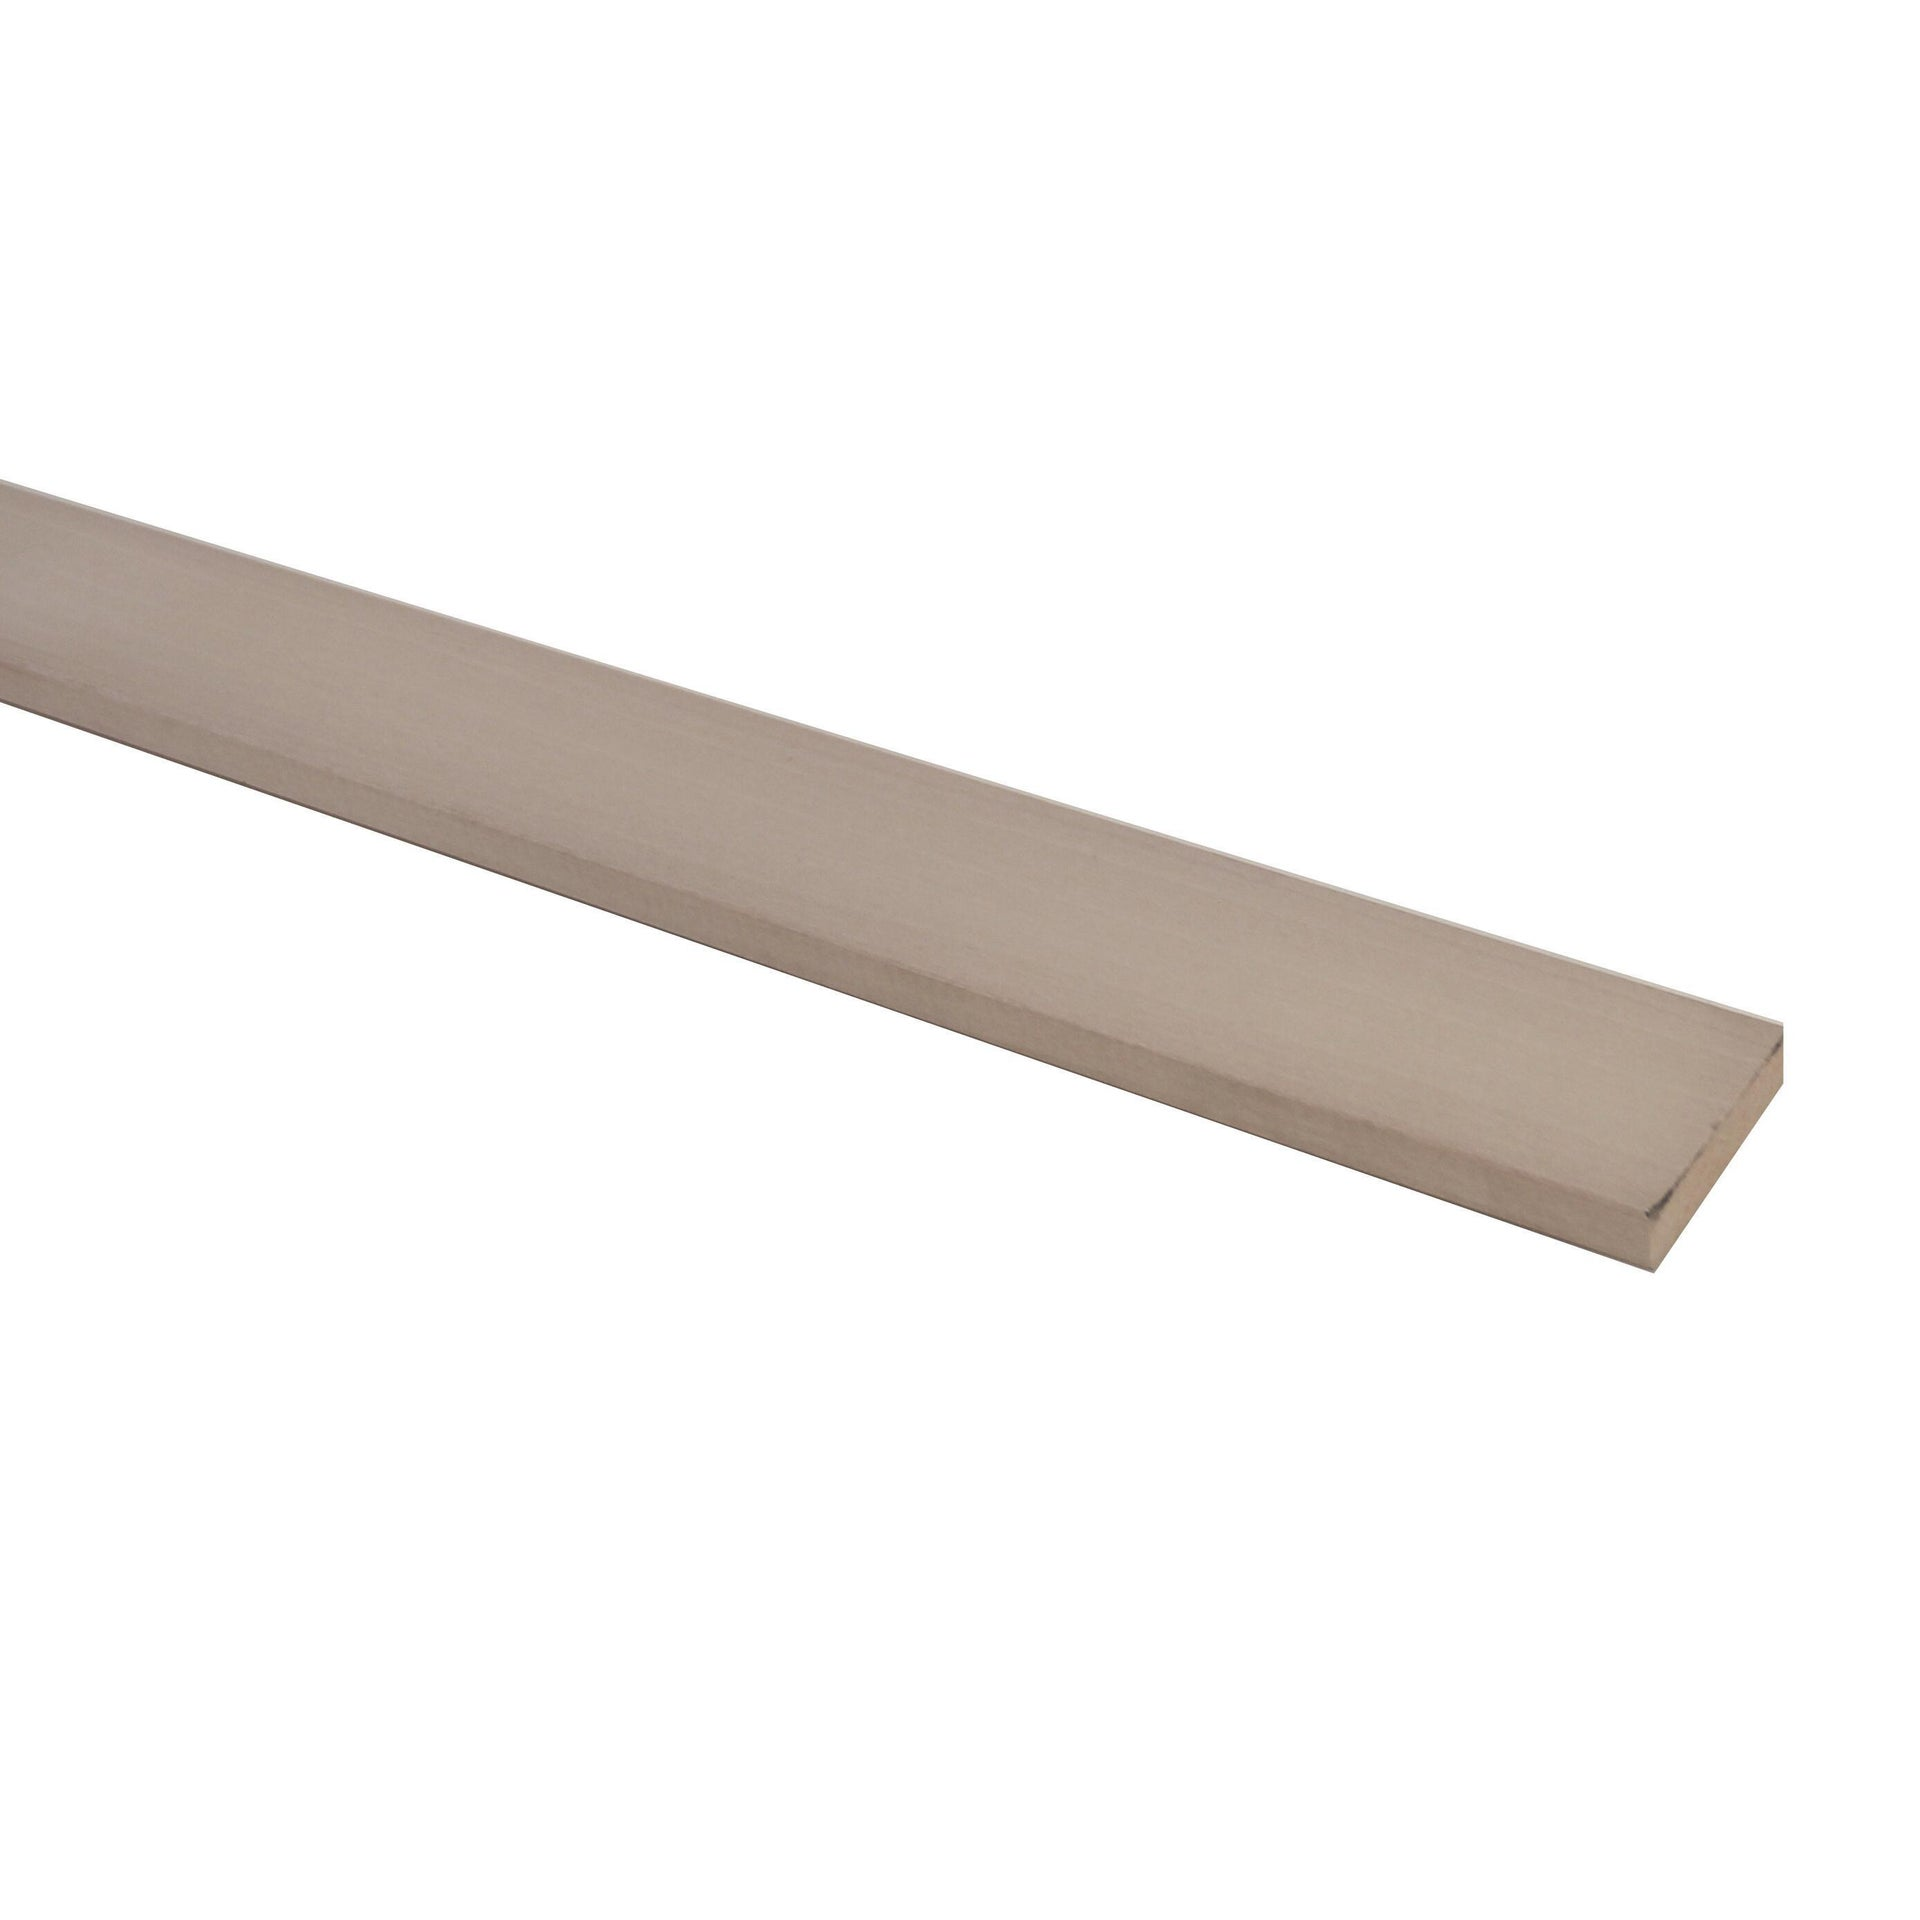 Listello piallato ayous 1 m x 30 mm, Sp 10 mm